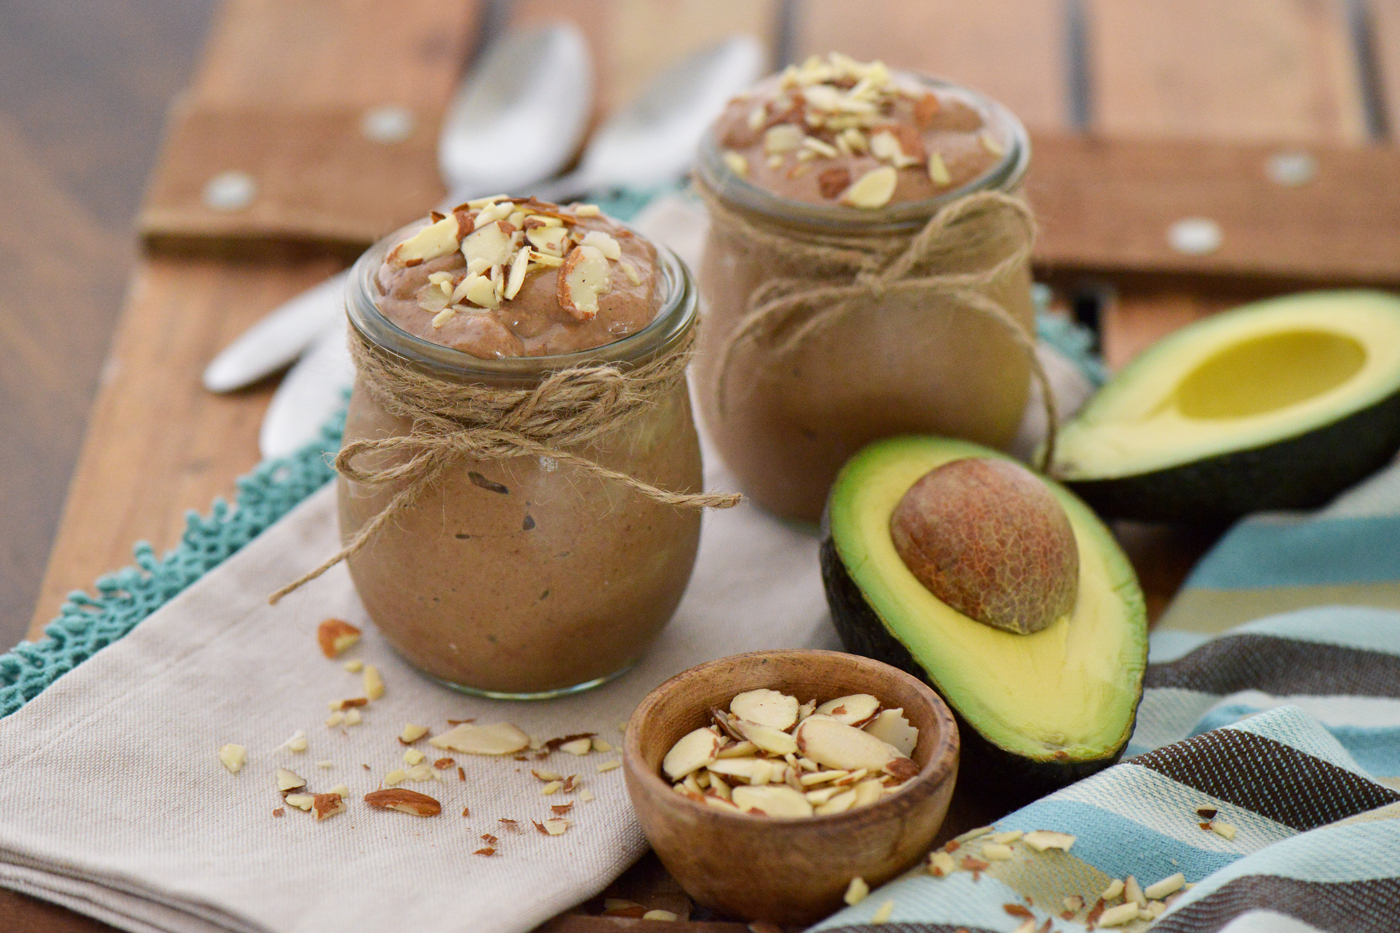 Čokoladni avokadov smuti z malinami.